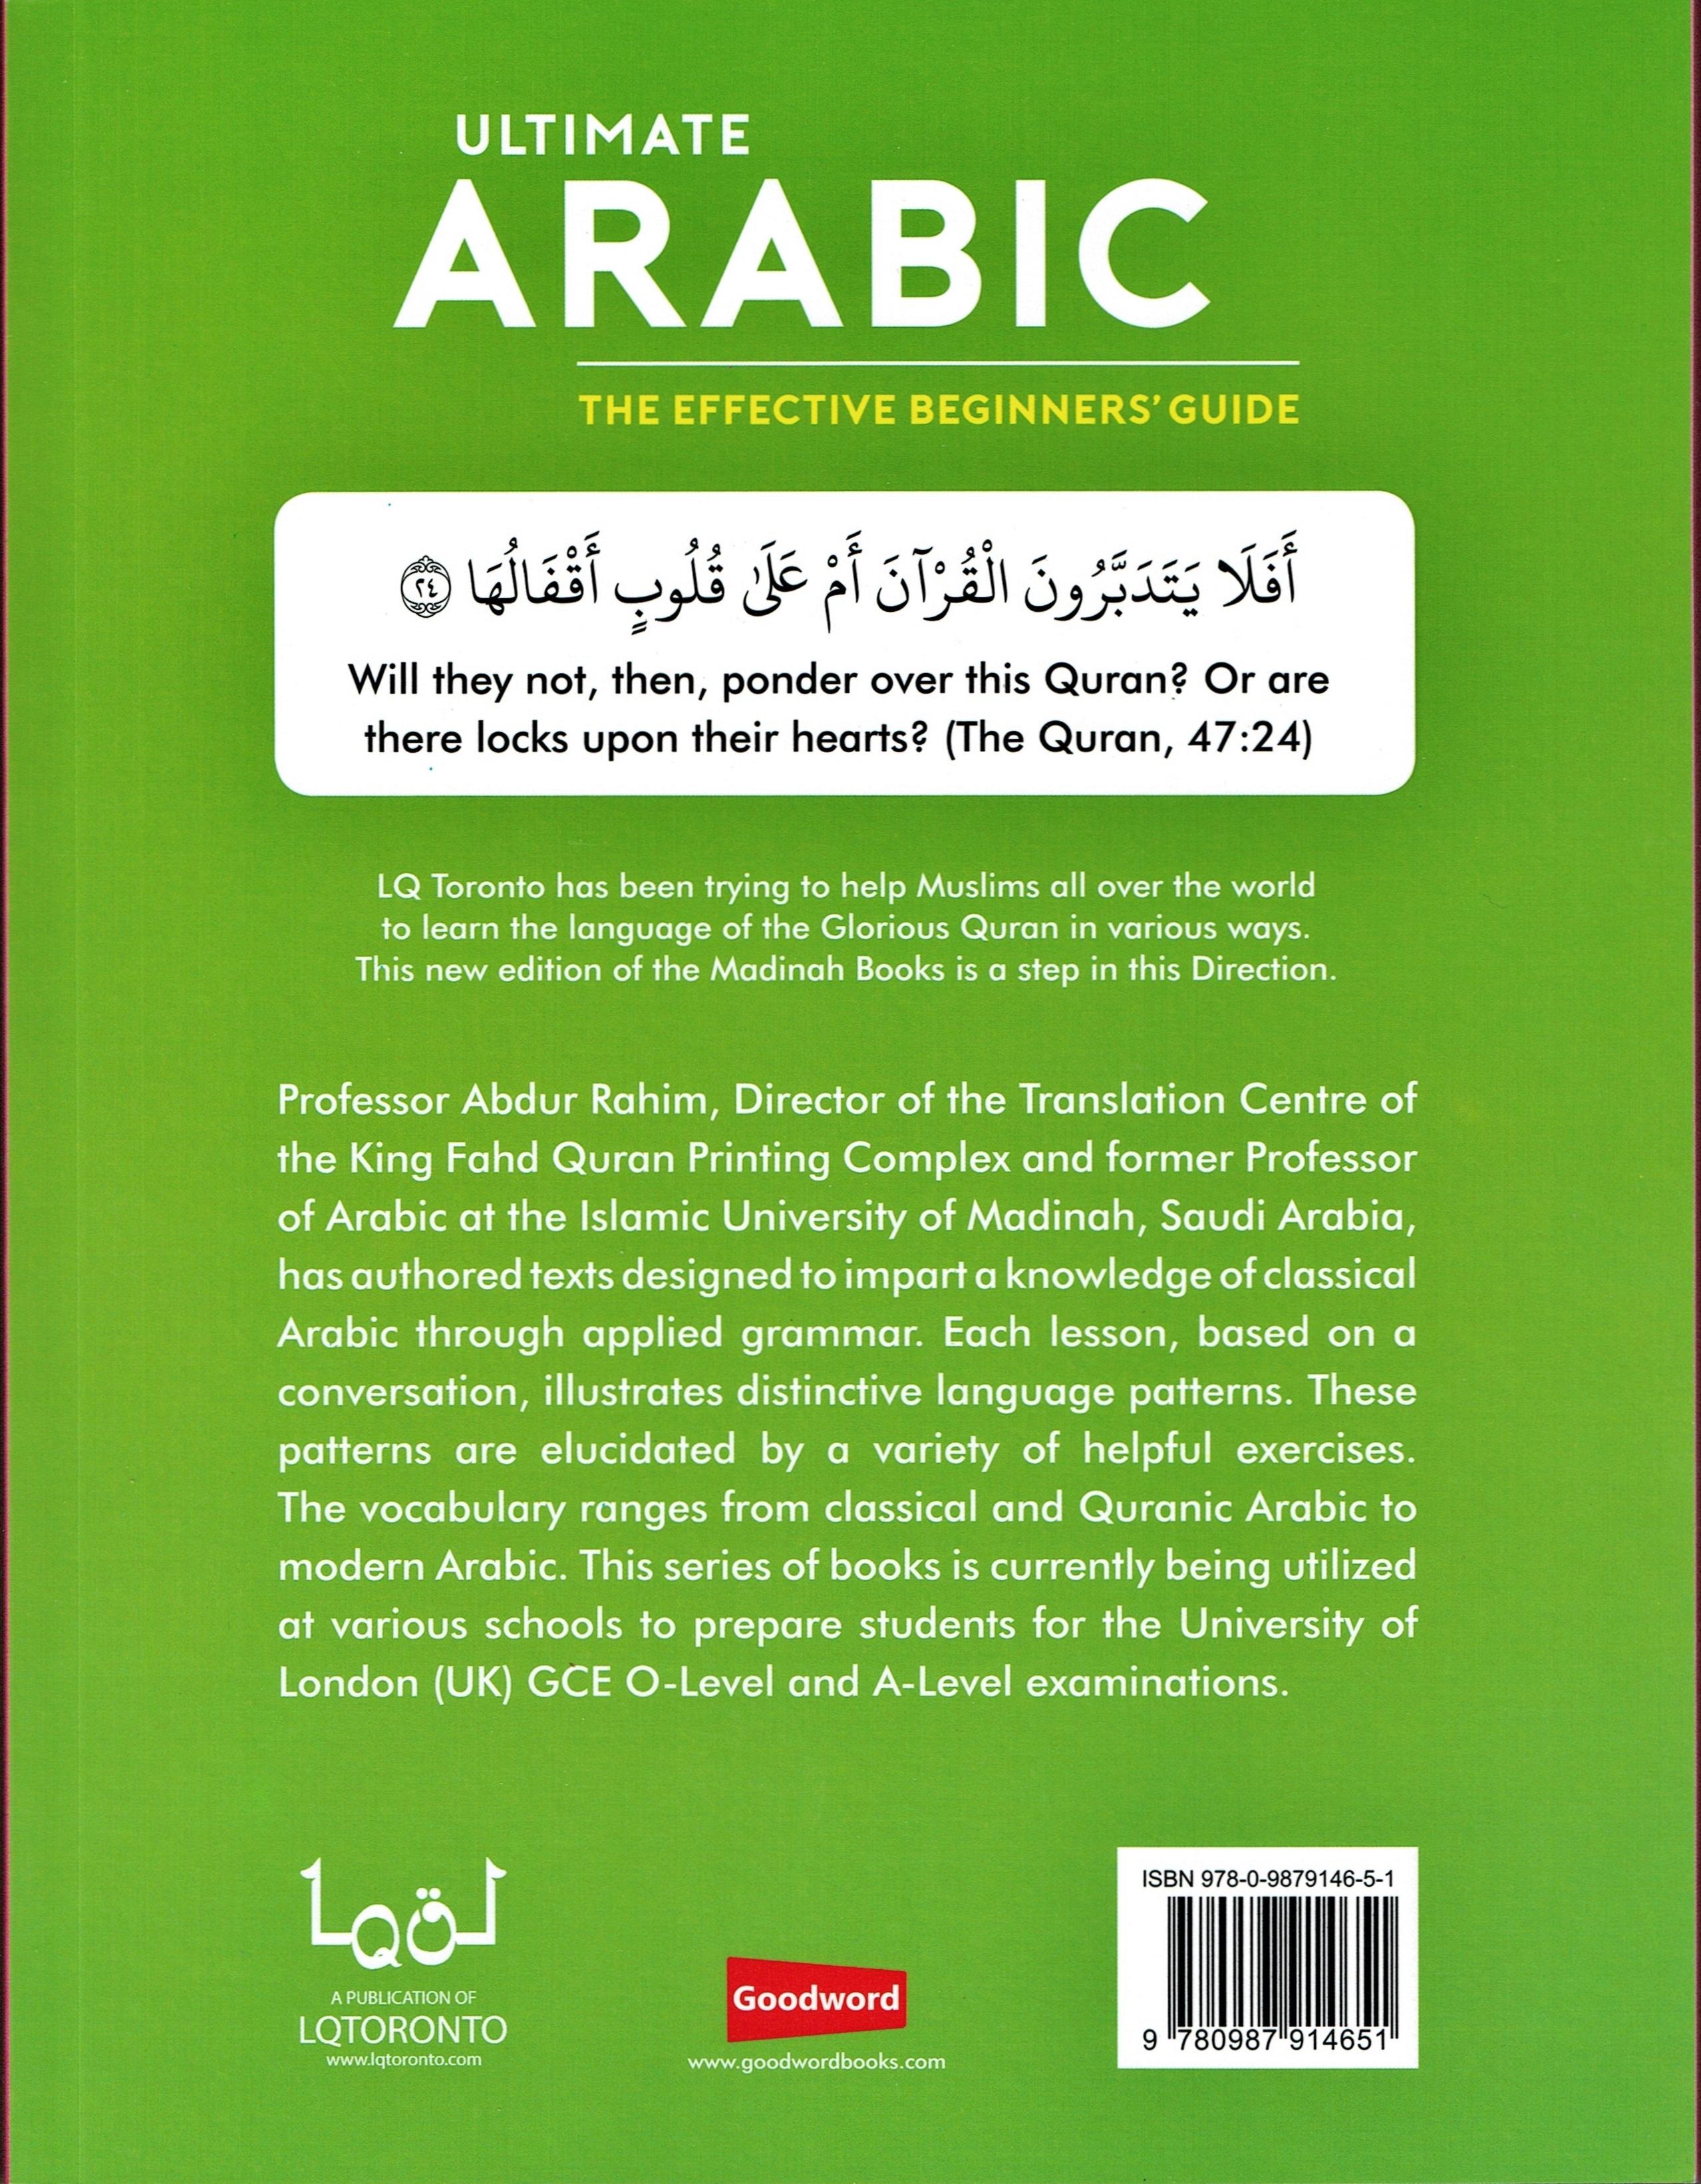 ultimate-arabic-course-book-3b-2-.jpg